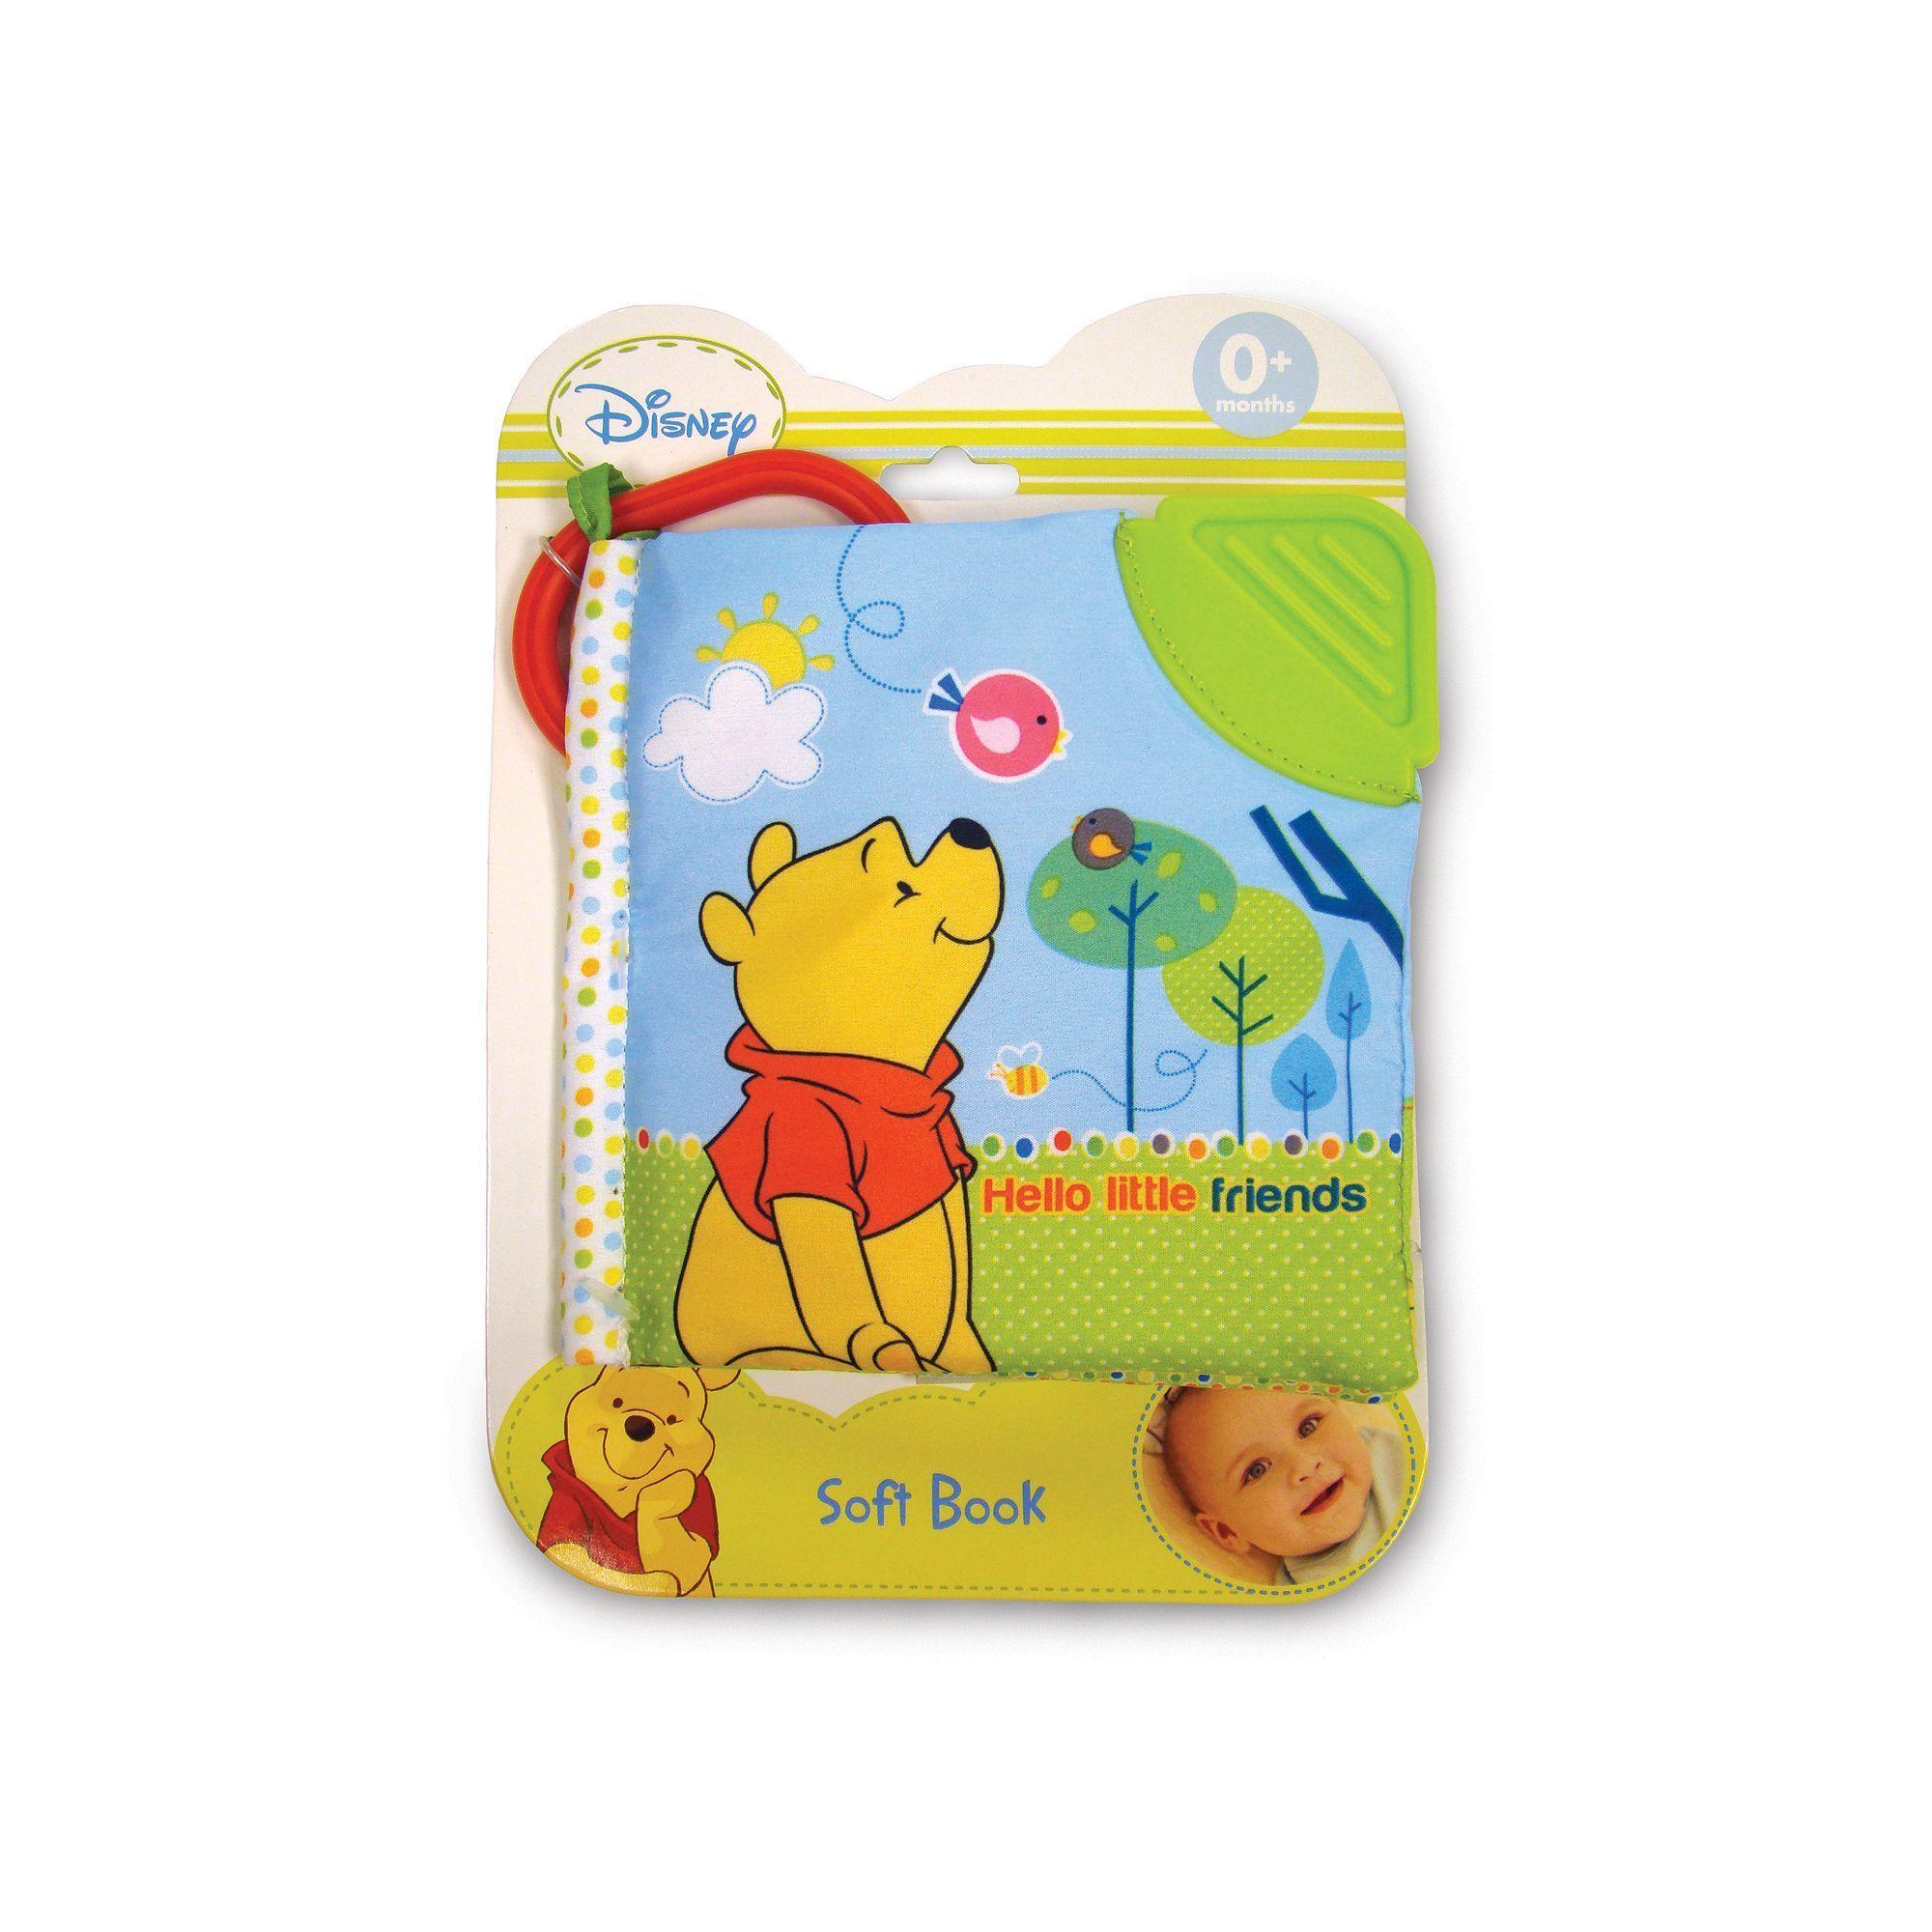 Disney Winnie the Pooh Hello Little Friends Soft Book by Kids Preferred, Multicolor